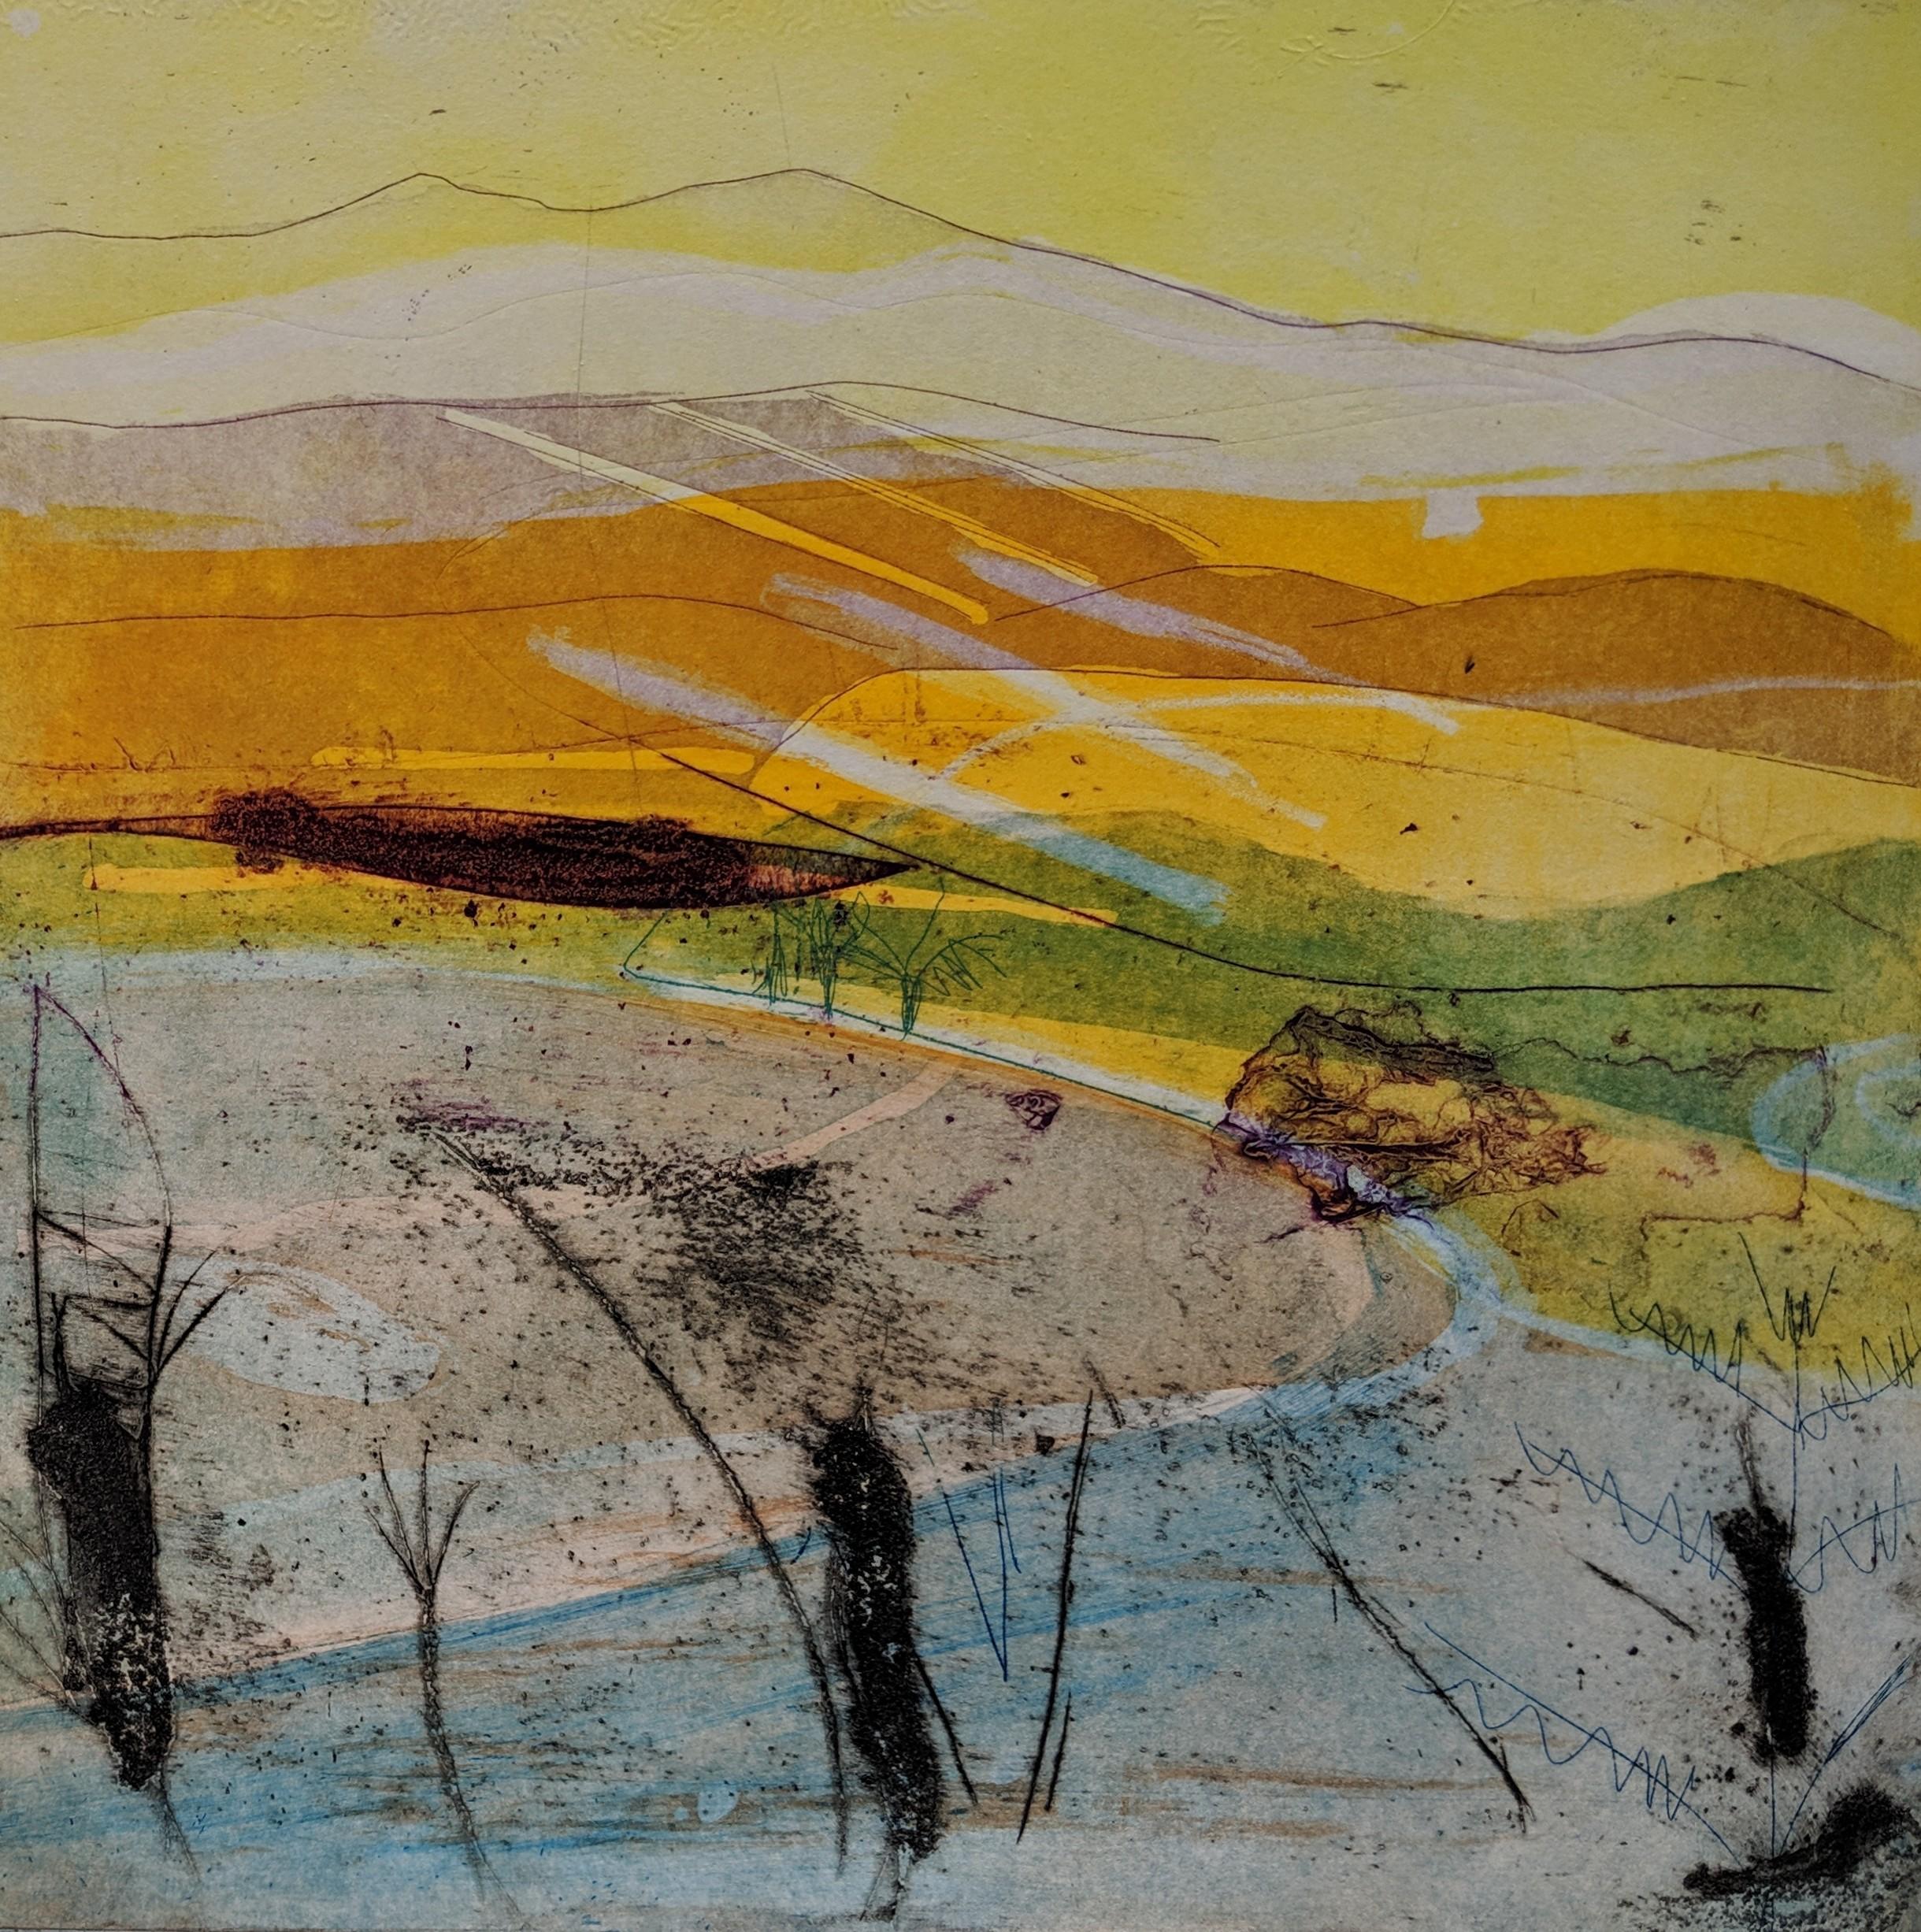 Artist: Louise Davies  Title: Winter's End  Size: 33 x 33 cm  Medium: Etching  (edition 2 / 75)  Price: £350 fr